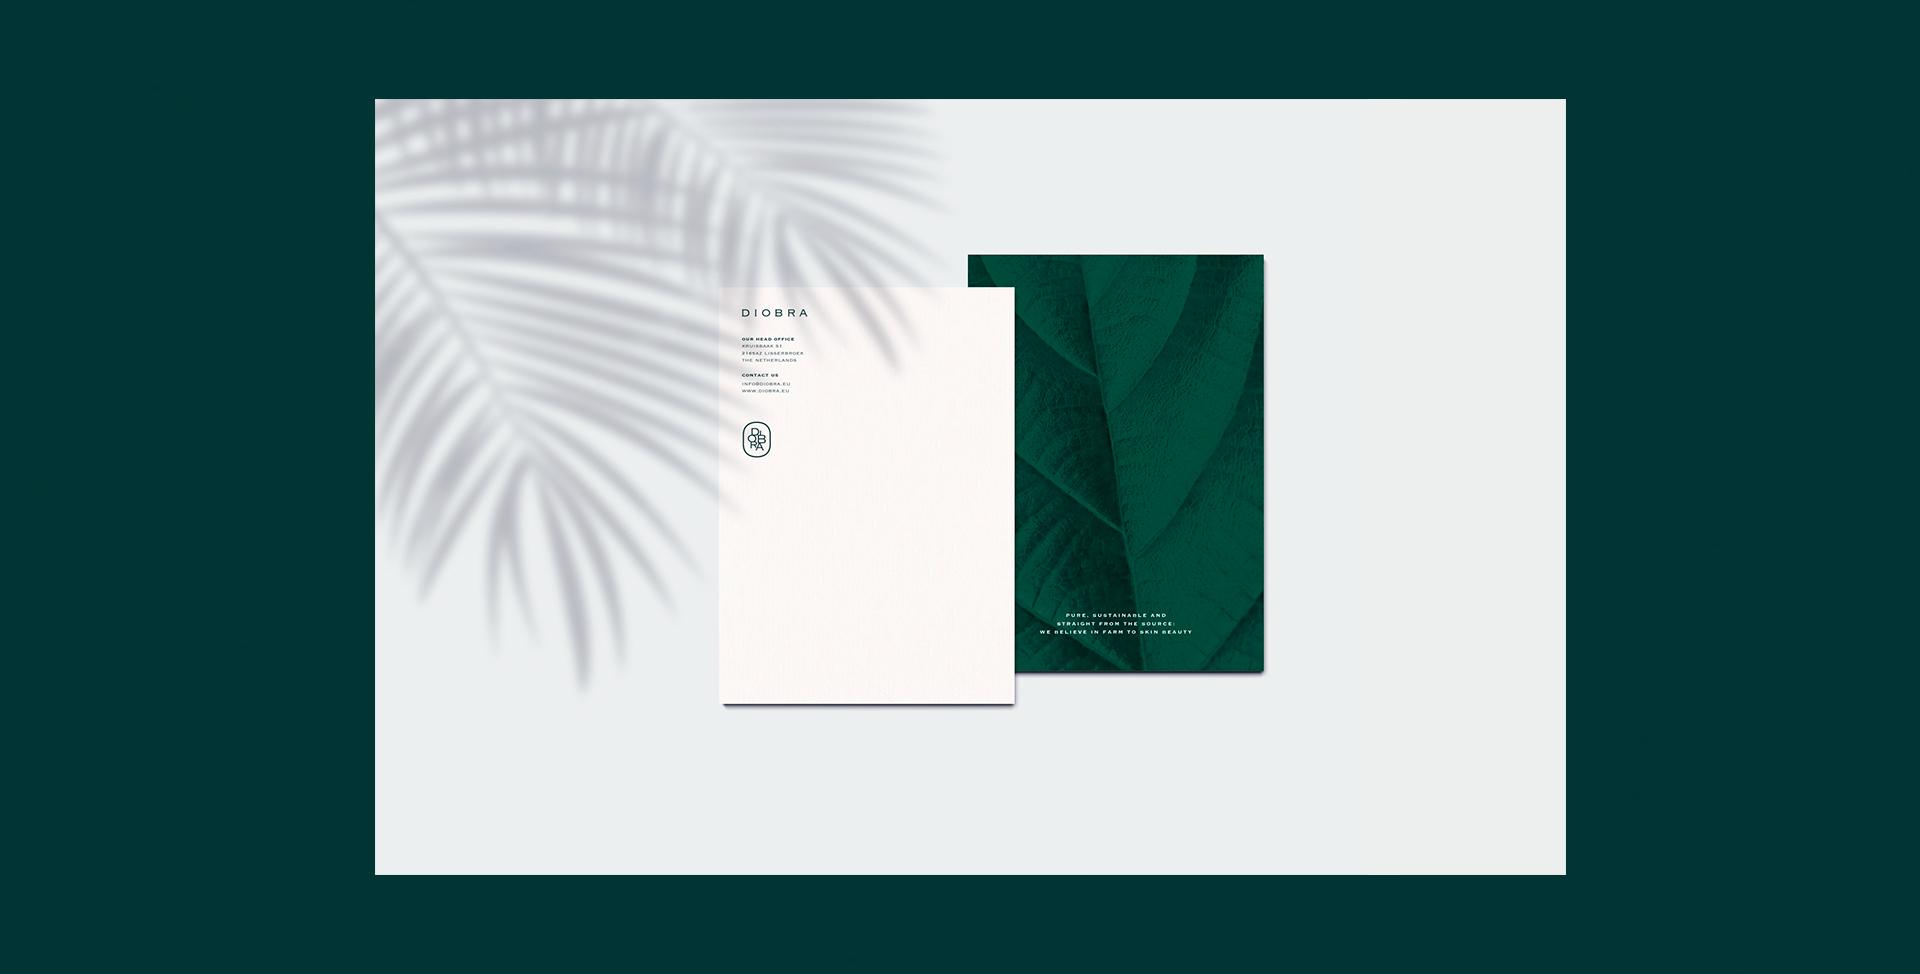 8diobra_identity_typograhpic_logo_design_leconcepteur_tamarapruis